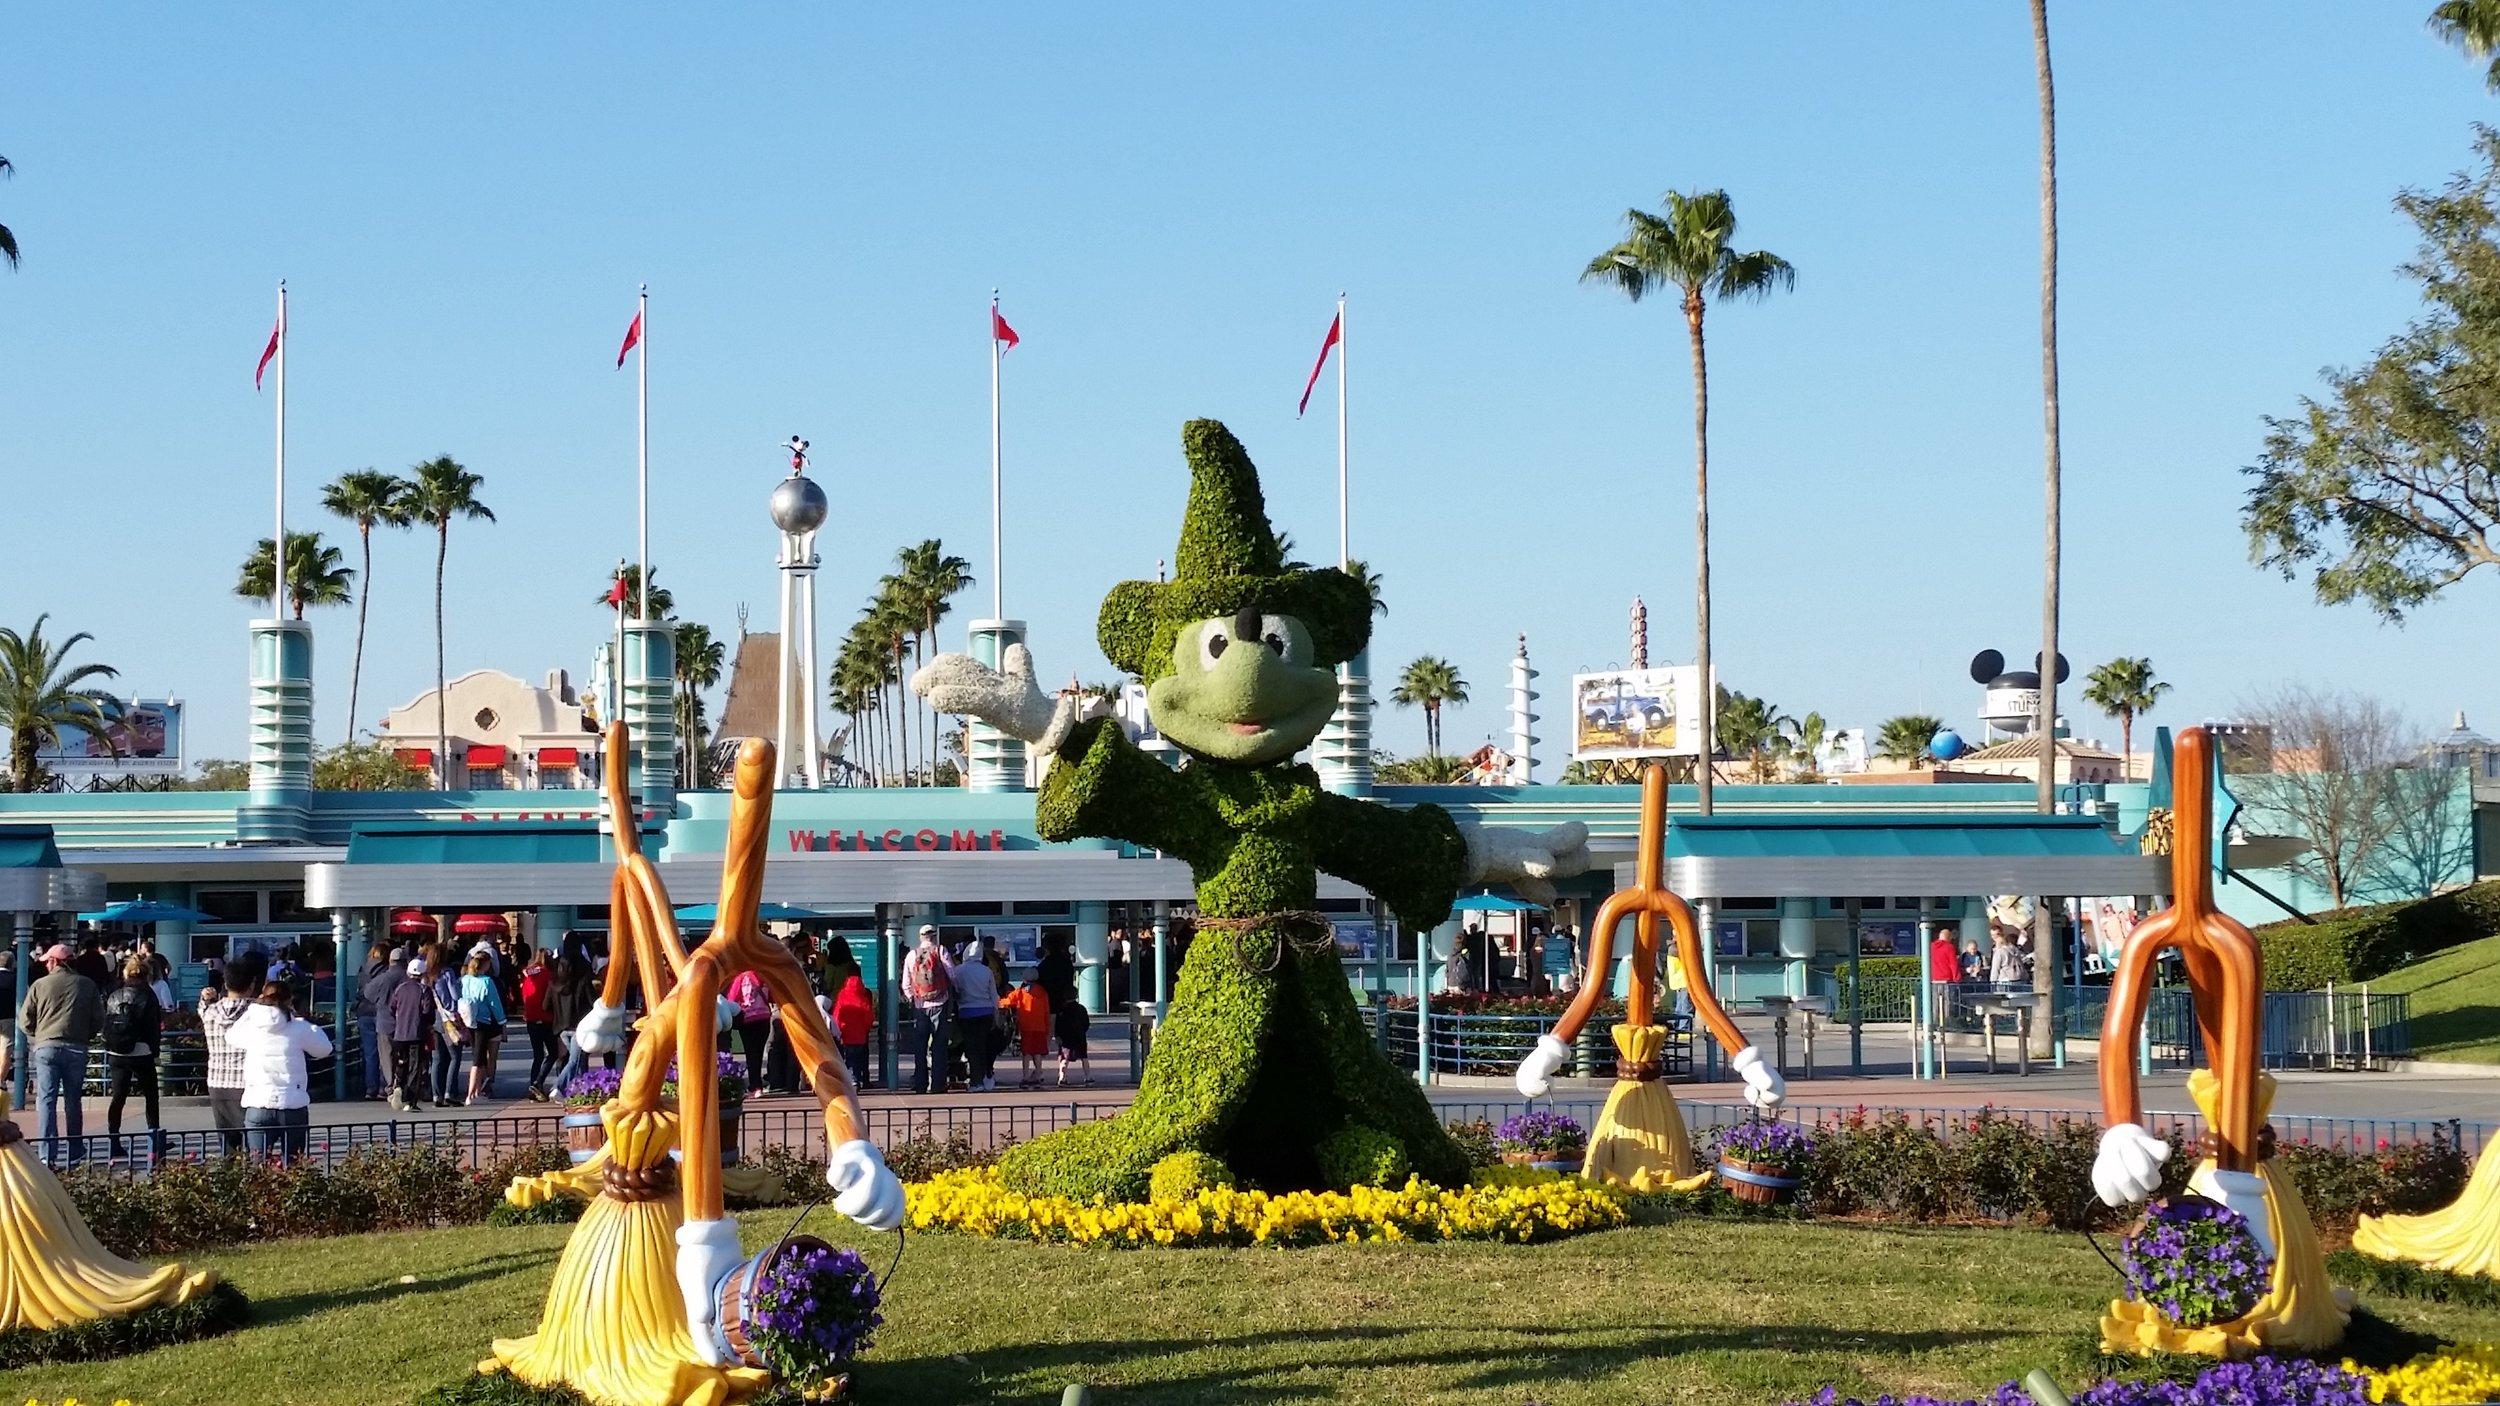 Entrance Plaza, Disney's Hollywood Studios